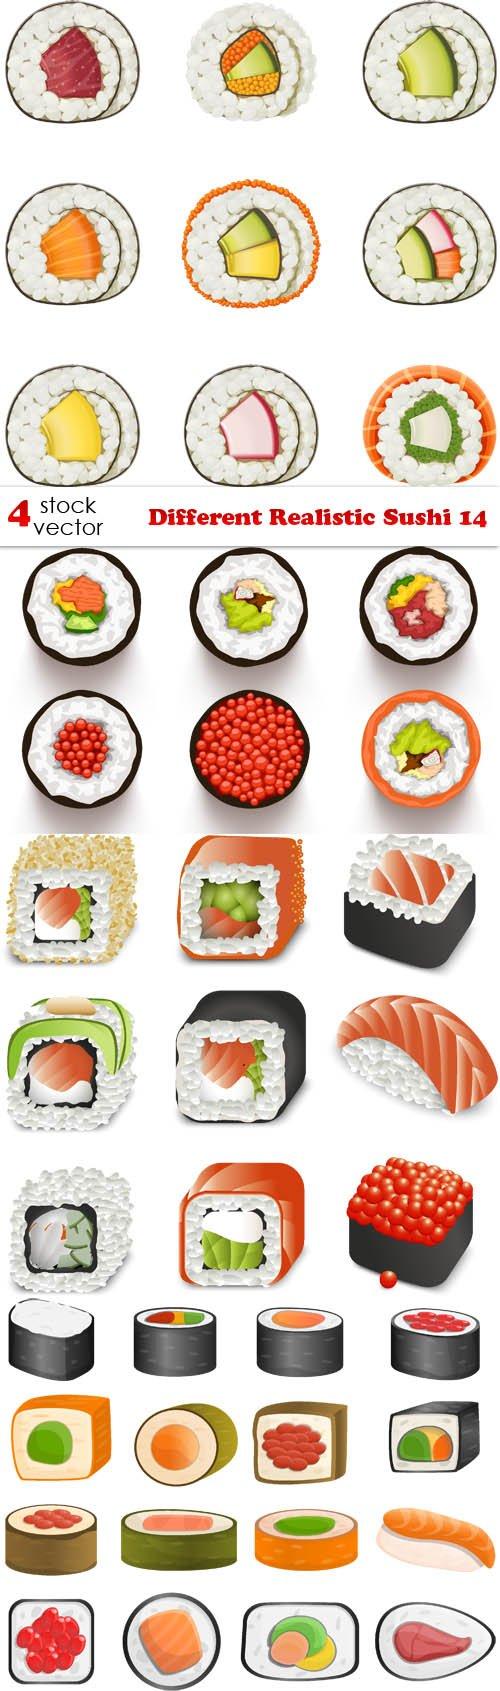 Vectors - Different Realistic Sushi 14